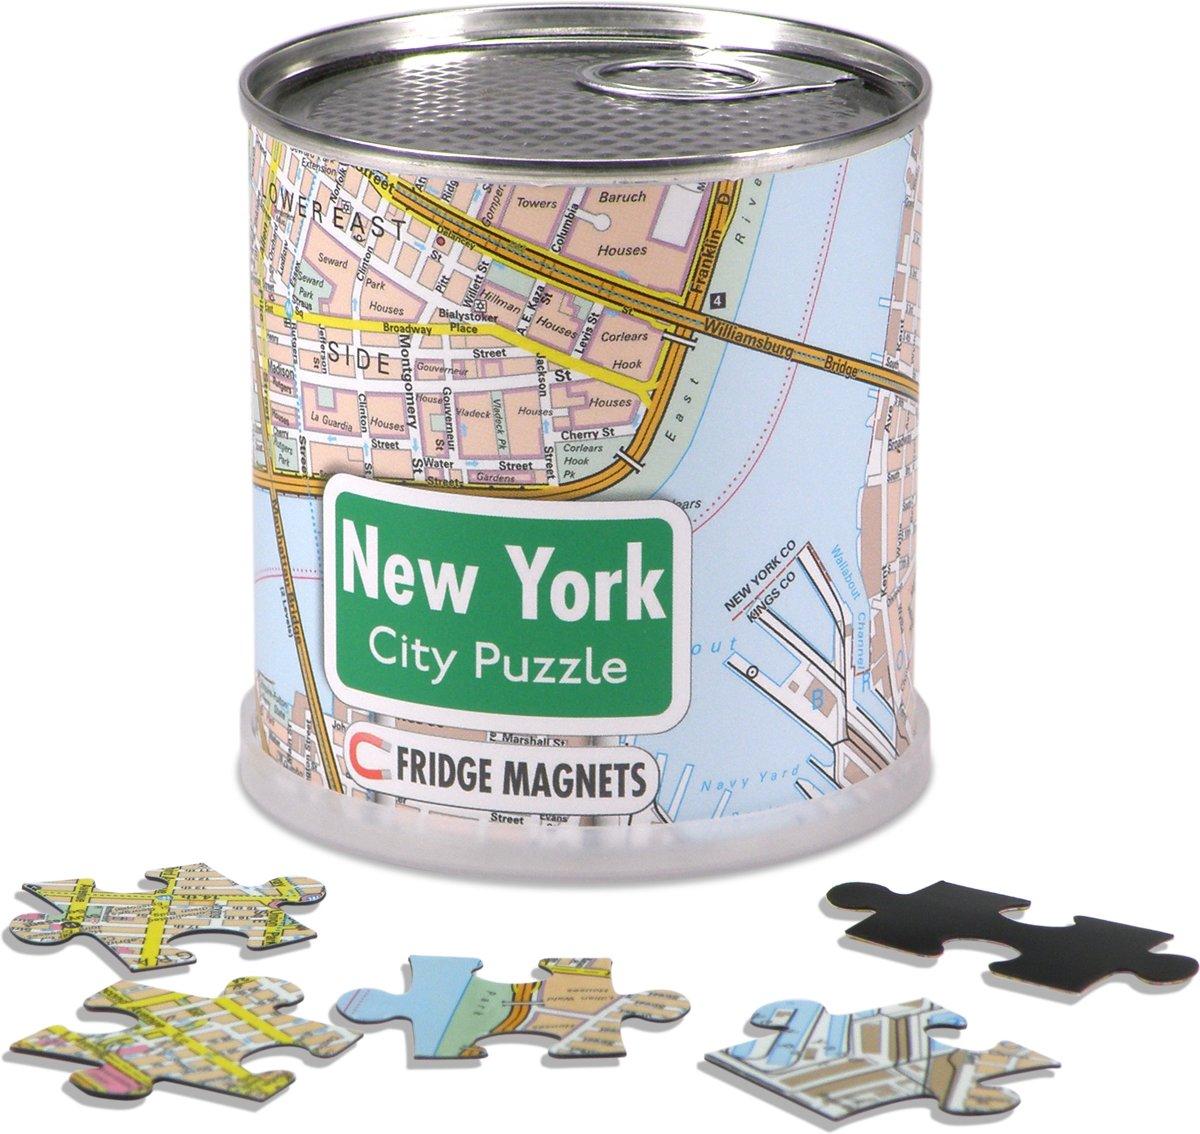 City Puzzle New York City - Puzzel - Magnetisch - 100 puzzelstukjes